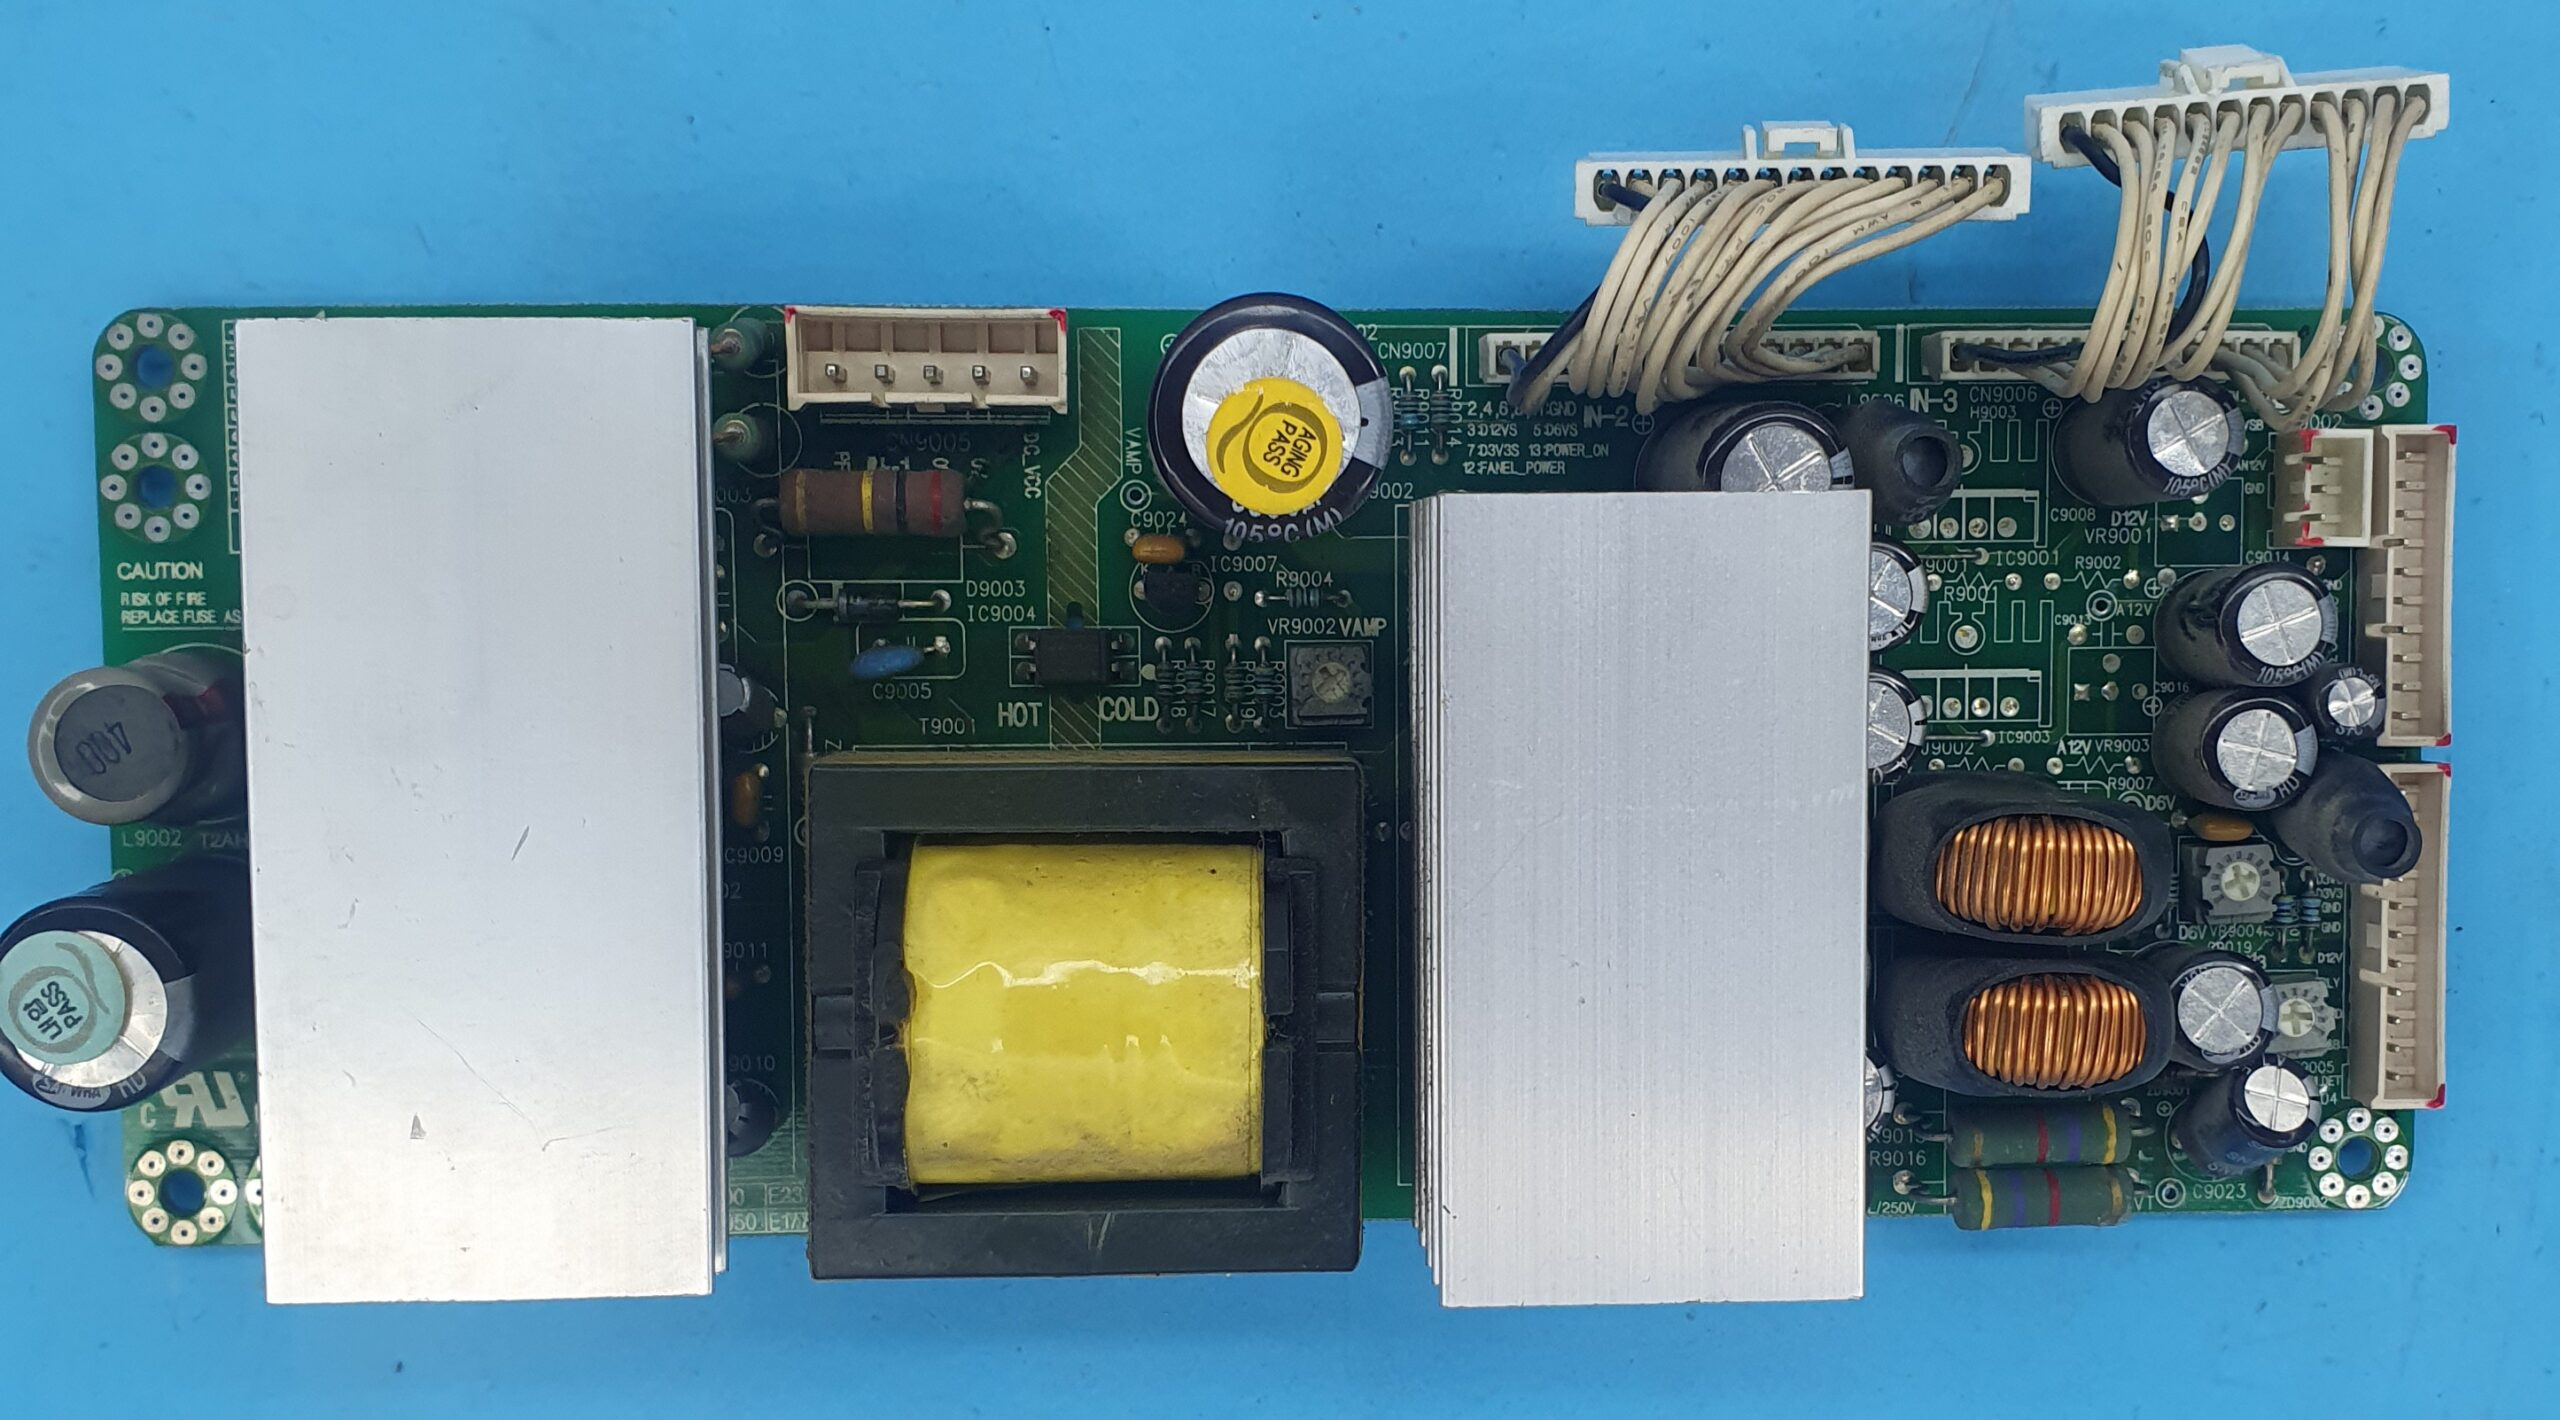 LJ44-00061A Samsung Power (KDV DAHİL = 100 TL)